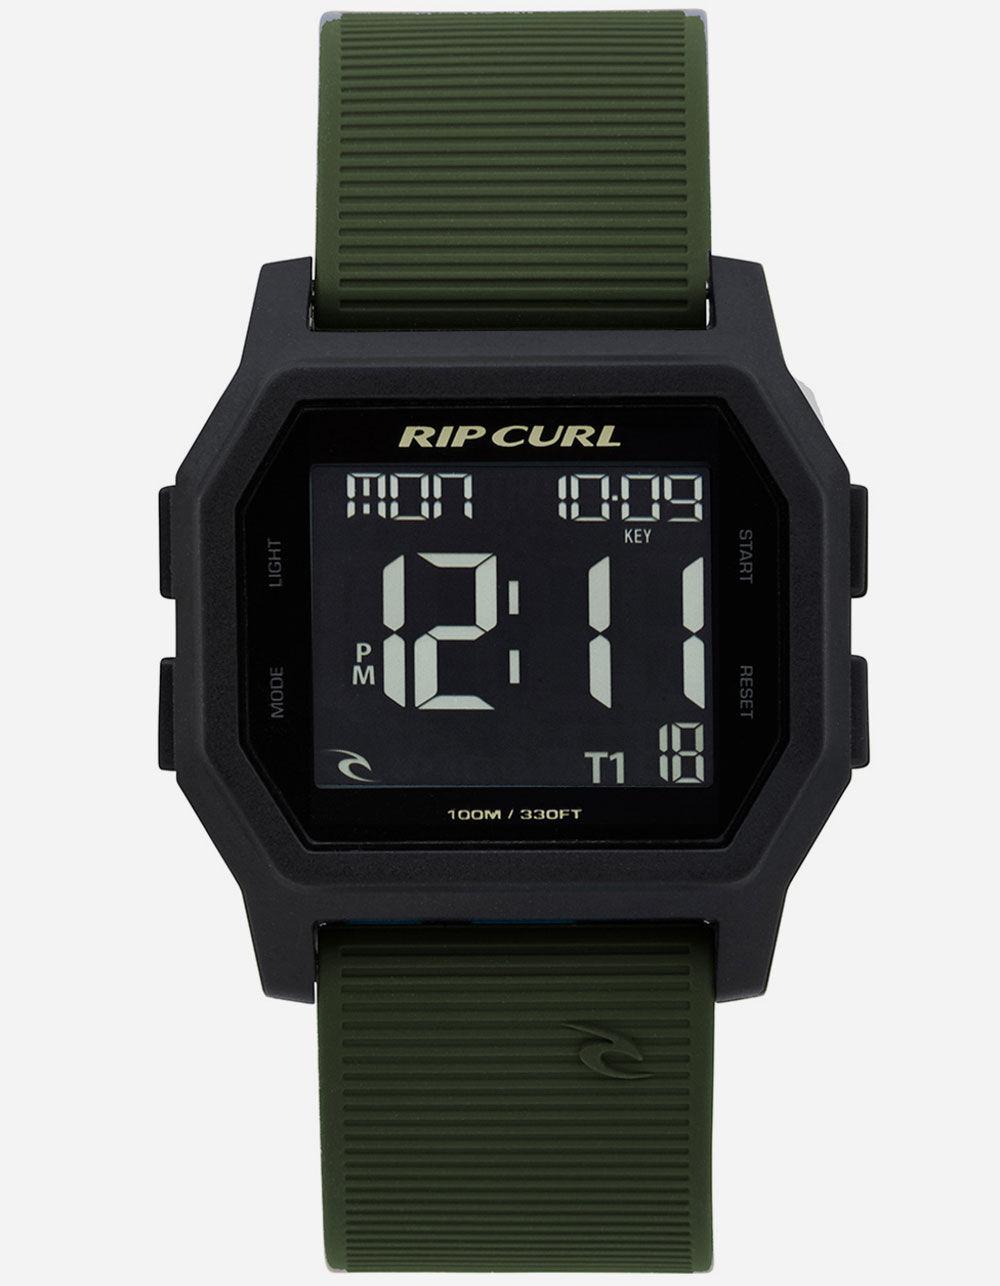 RIP CURL Atom Black & Green Digital Watch